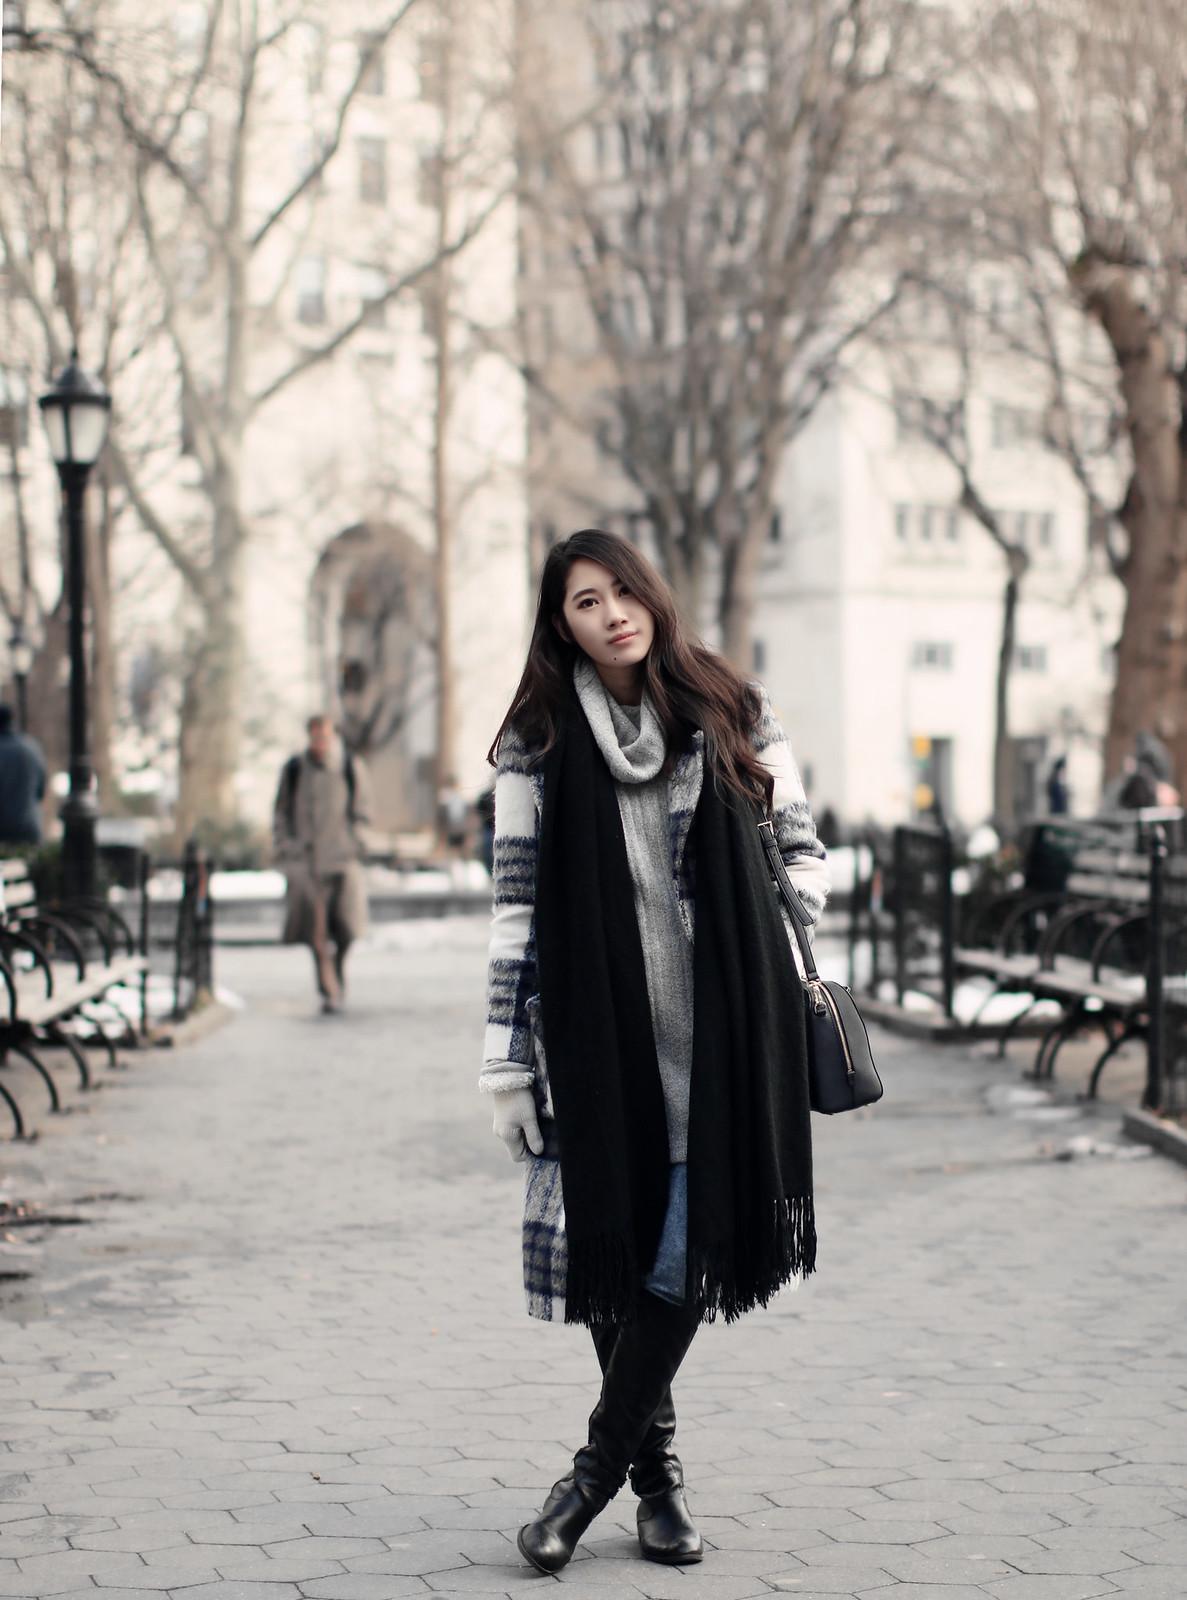 2083-clothestoyouuu-elizabeeetht-nyfw-newyorkfashionweek-nyc-fashionweek-newyork- winter2017-fashion-ootd